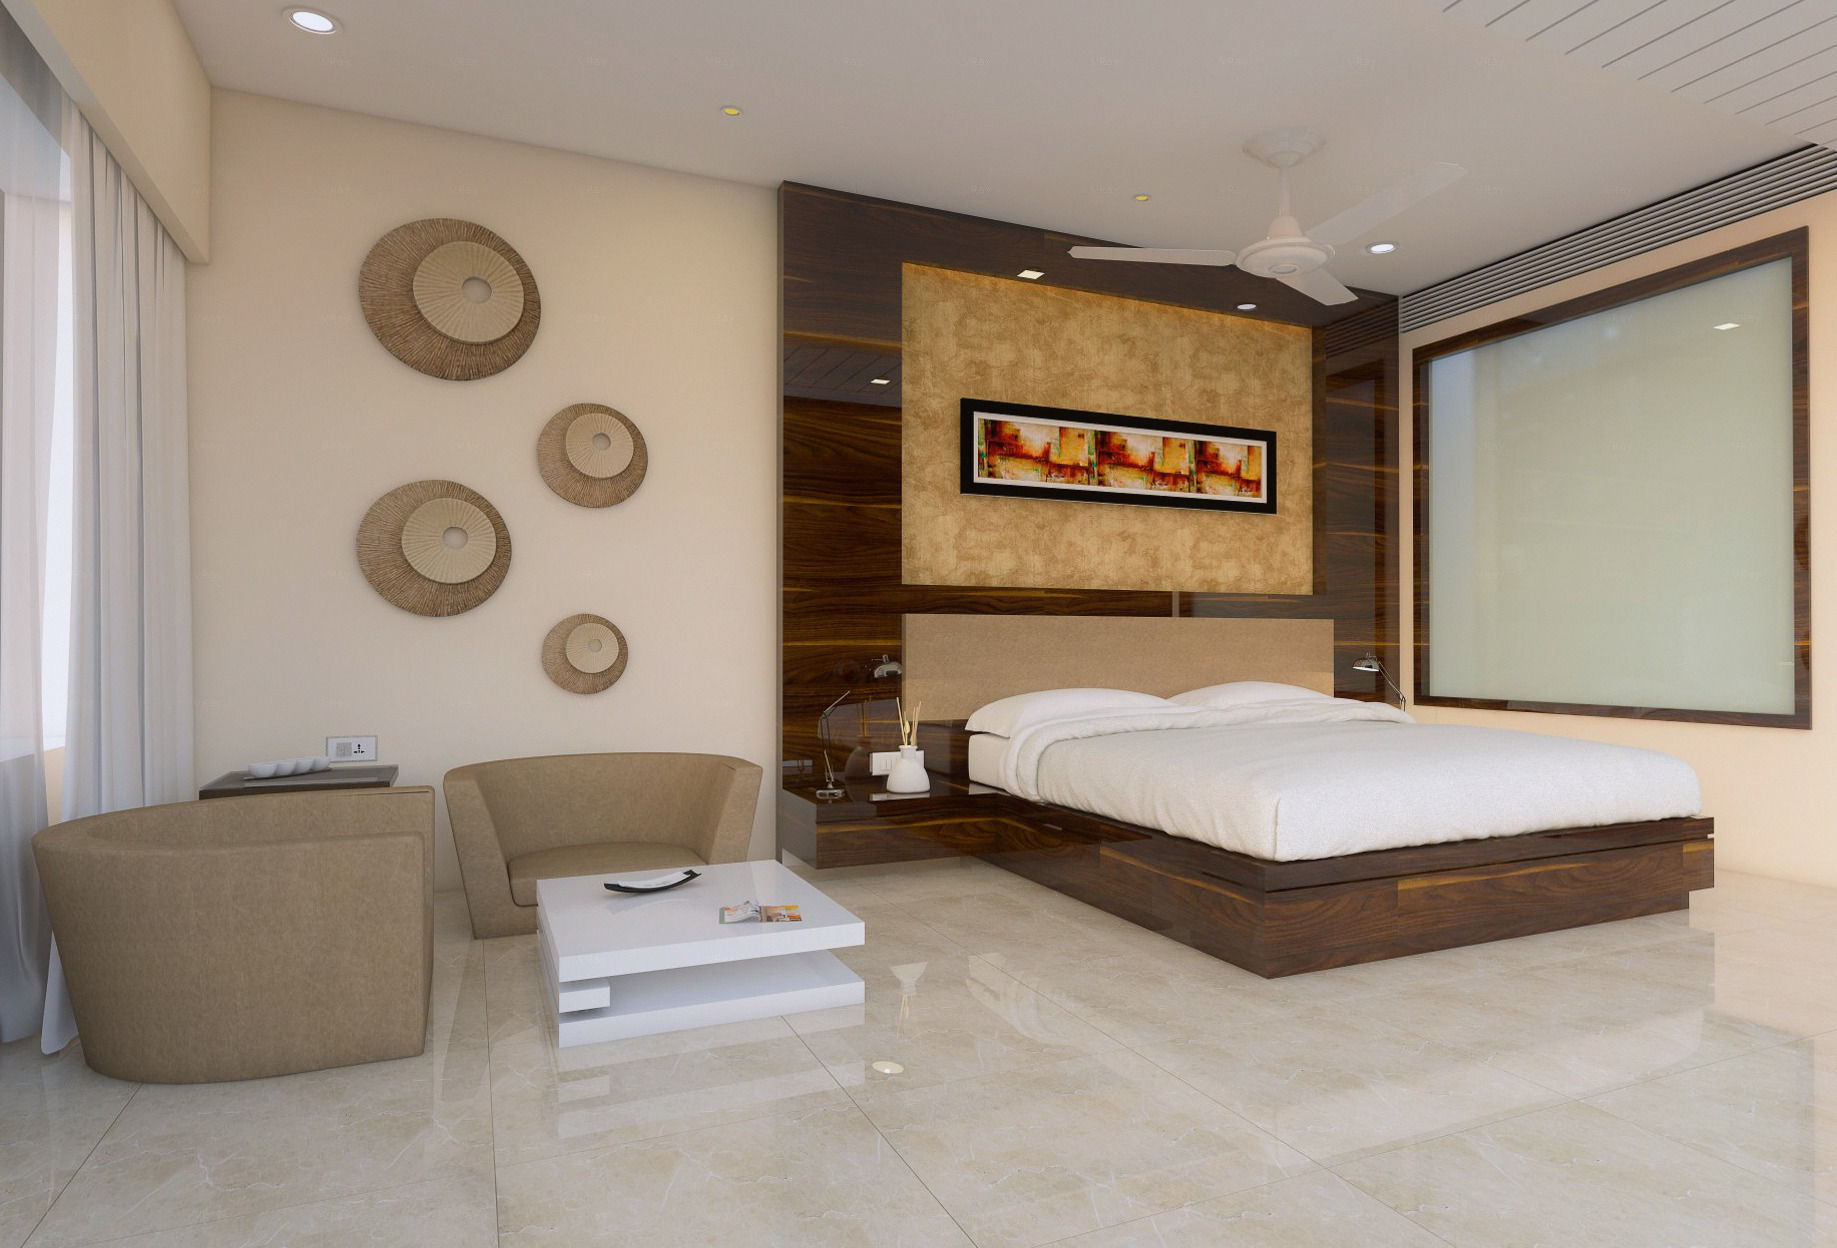 hotel bedroom 3d interior view 3d model skp 1 ...